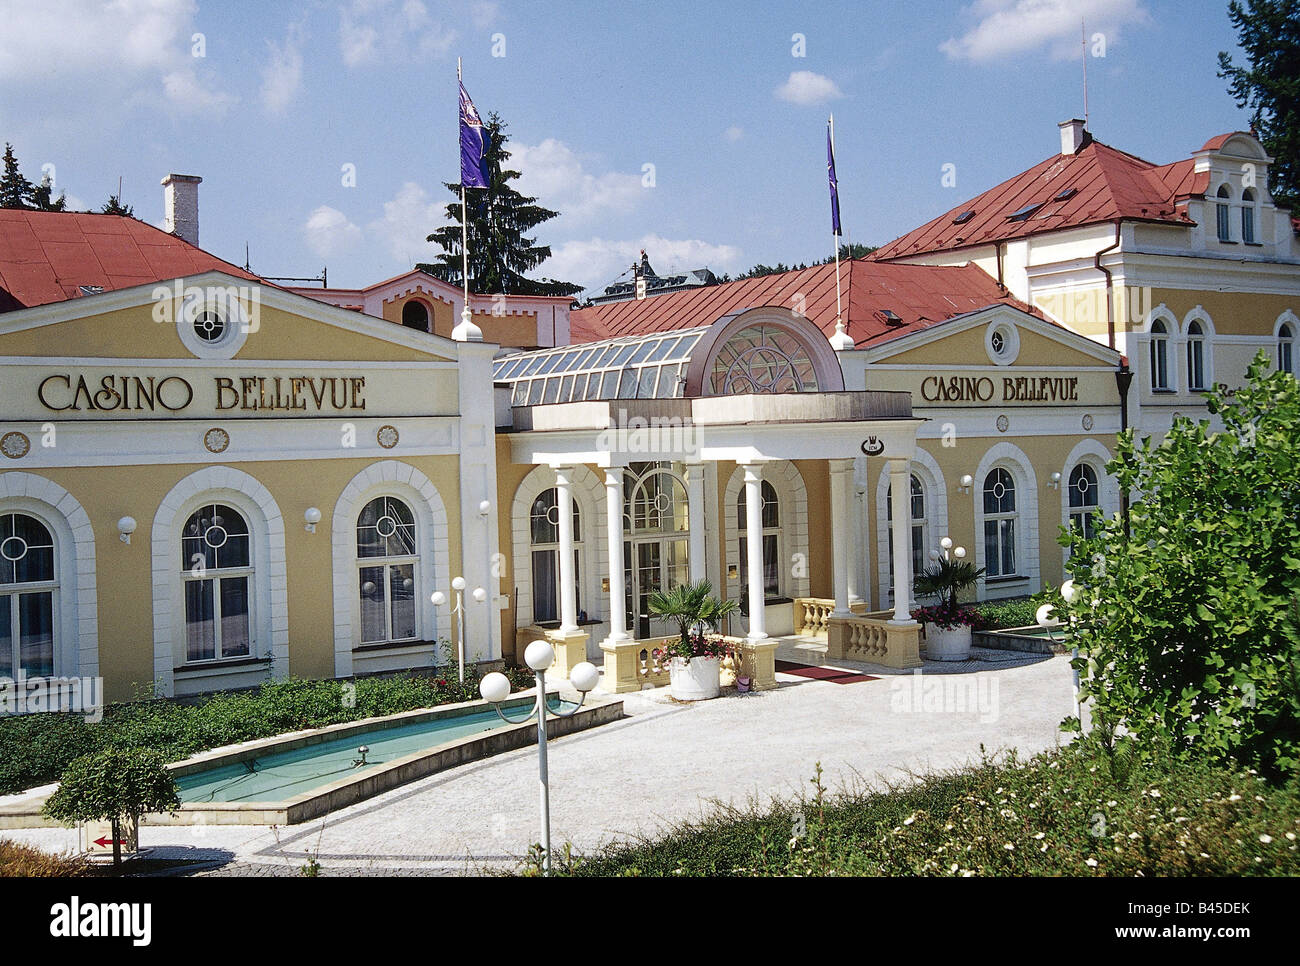 INGO Casino Bellevue Marienbad